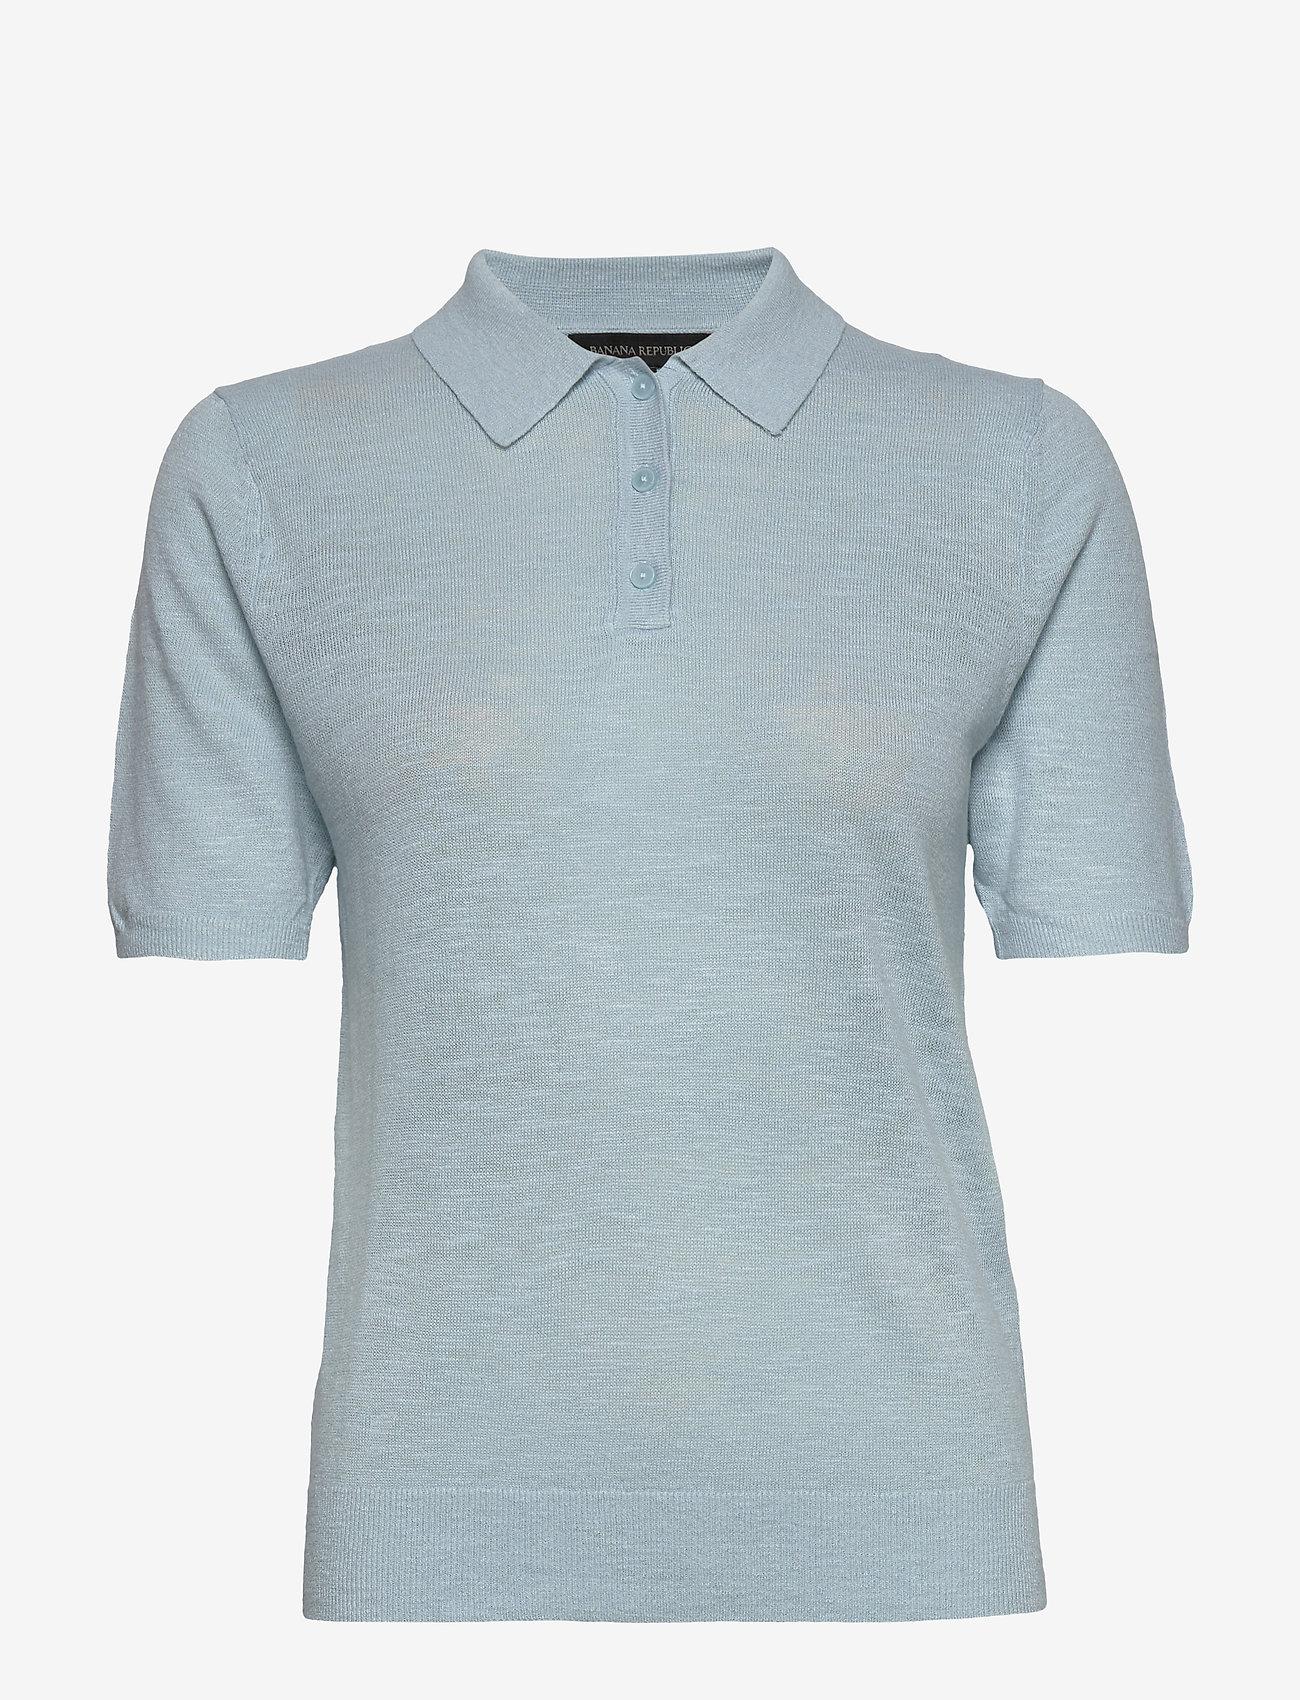 Banana Republic - Linen-Blend Sweater Polo - knitted tops - light blue - 0